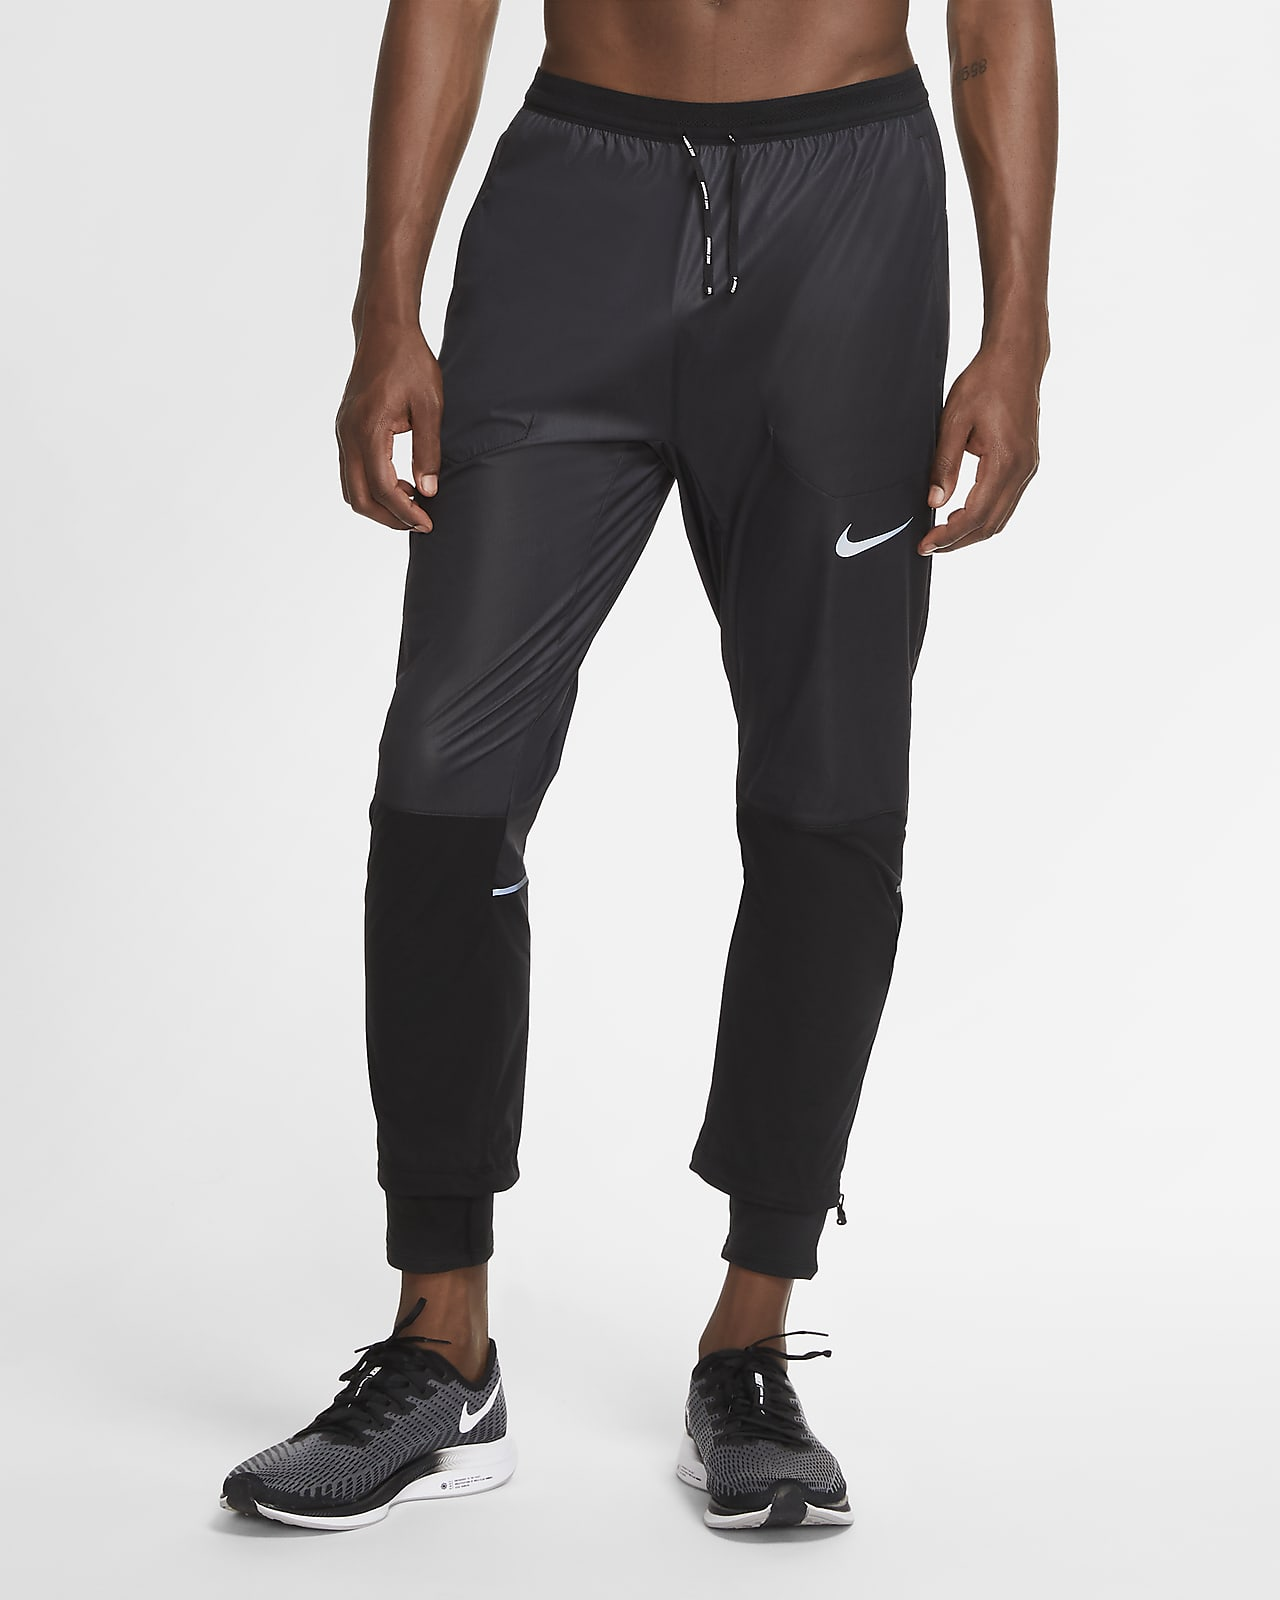 Мужские беговые брюки Nike Swift Shield